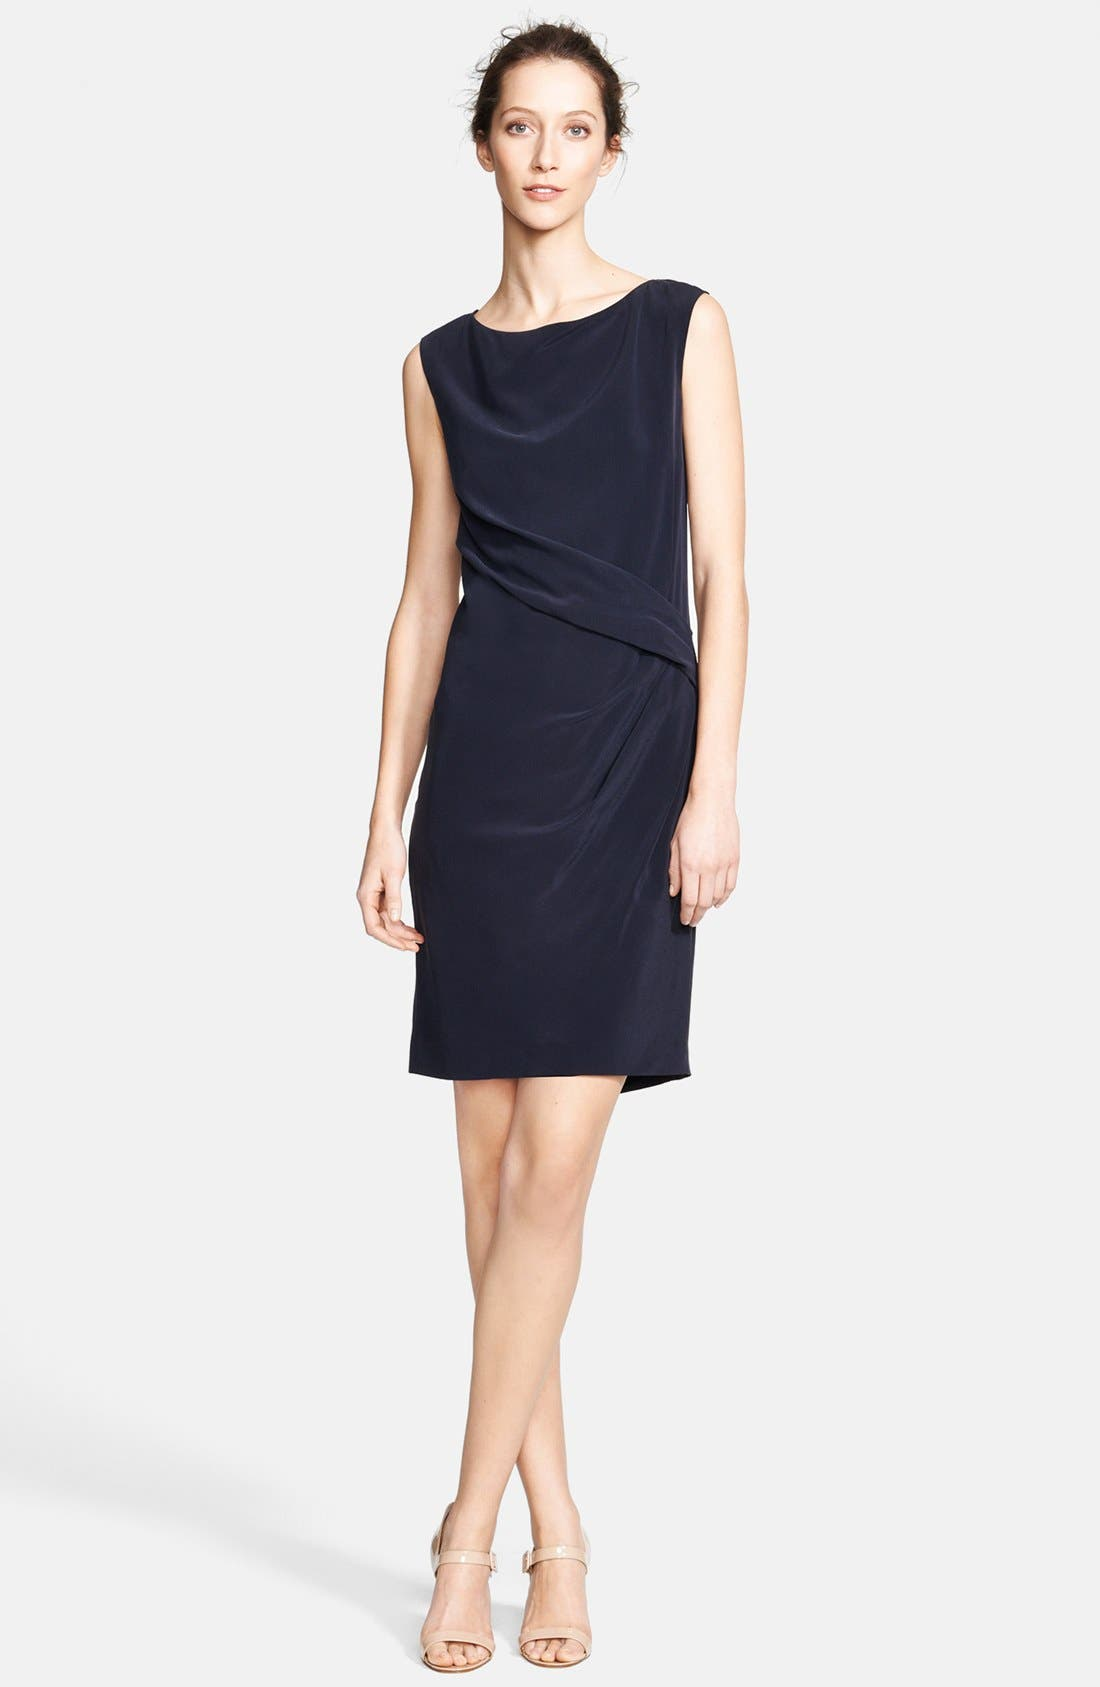 Main Image - Max Mara Silk Dress & Accessories